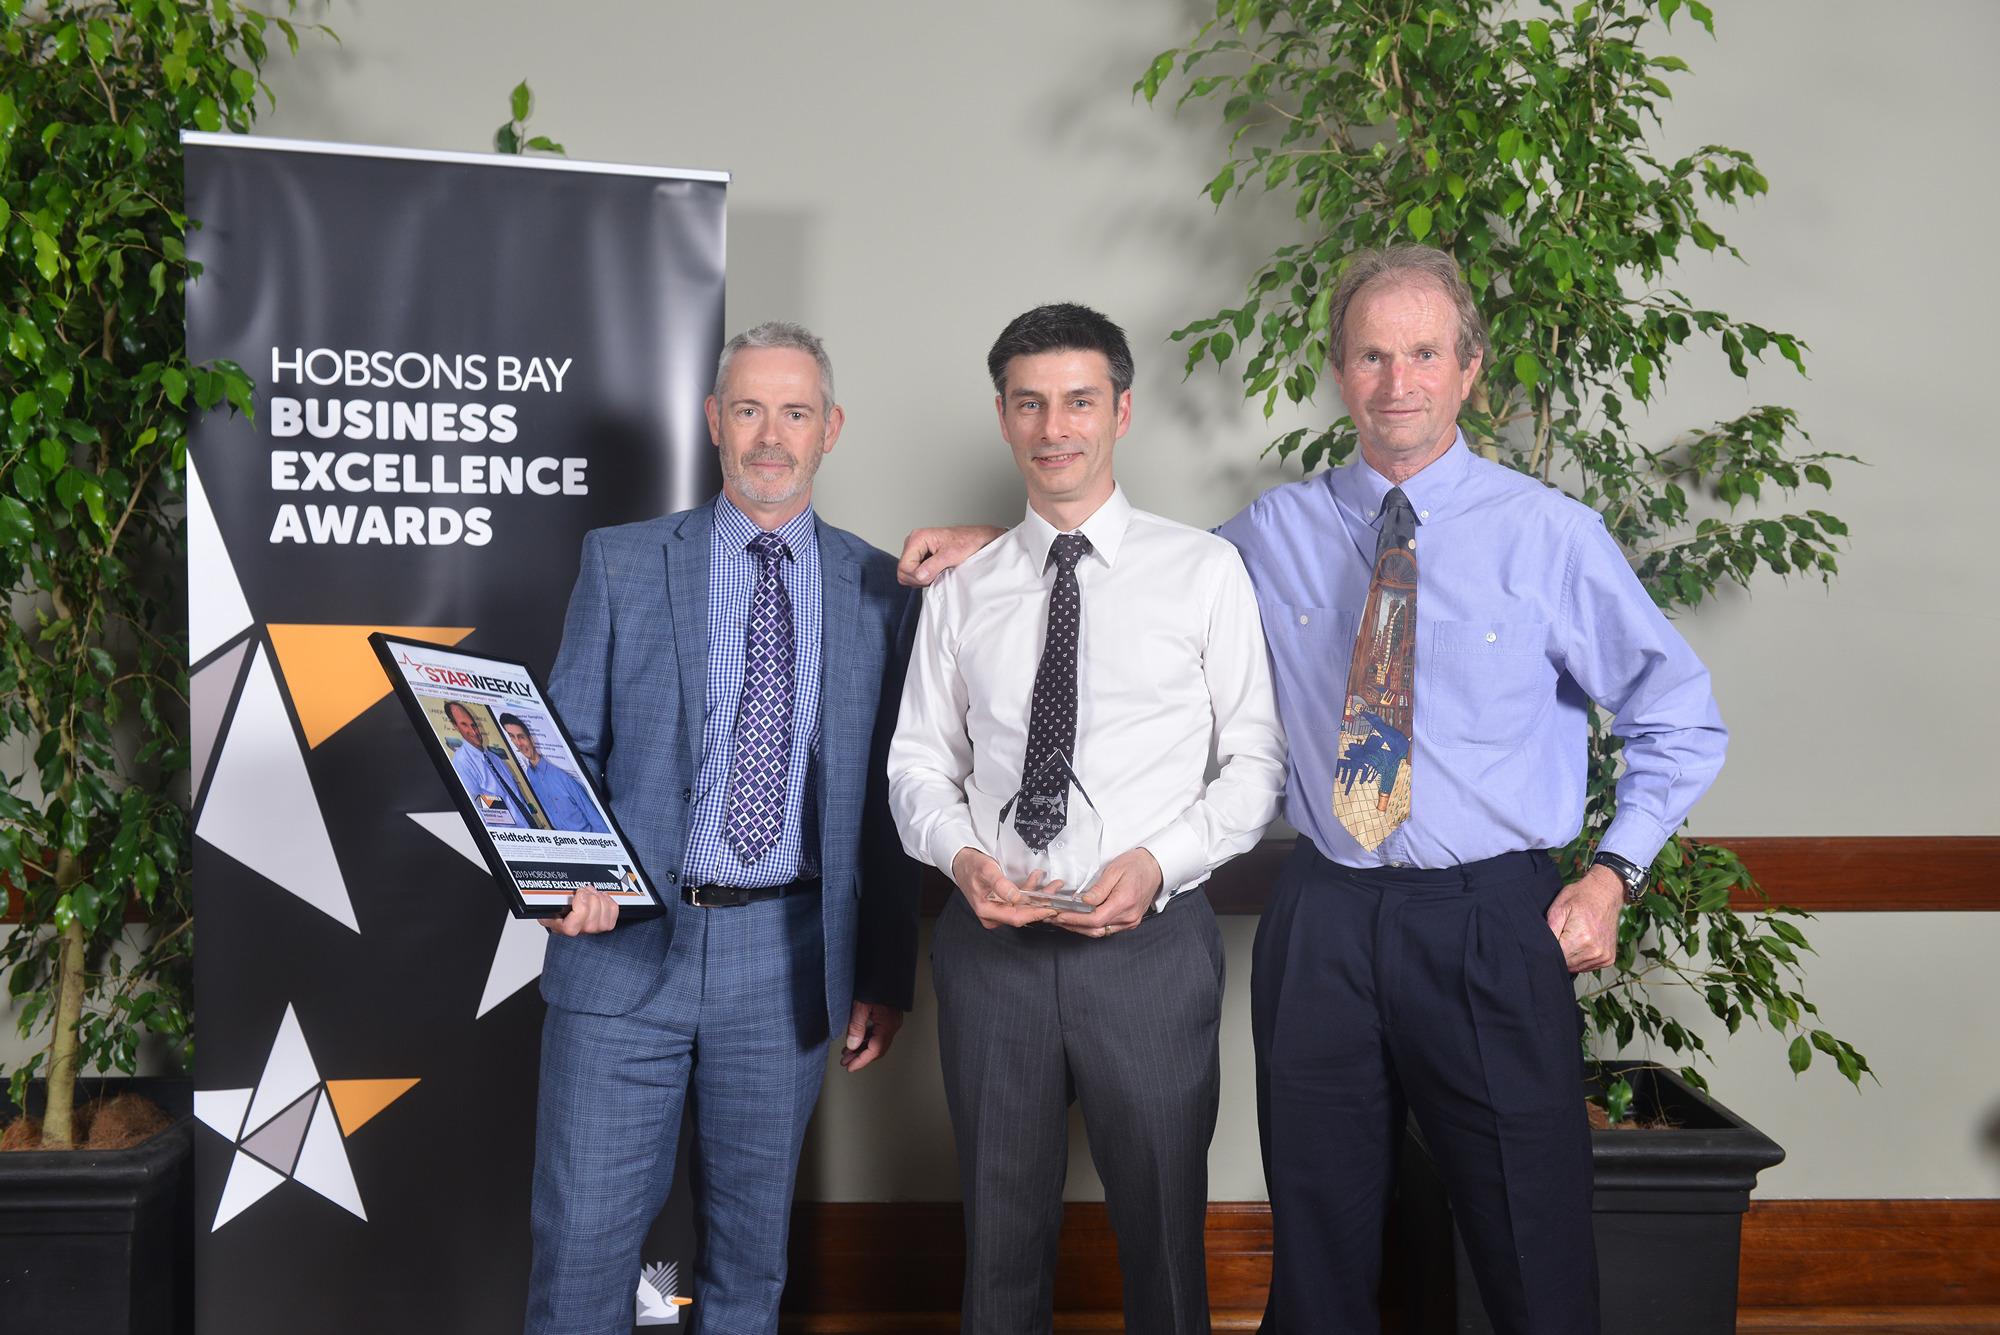 0041-hb-bus-awards